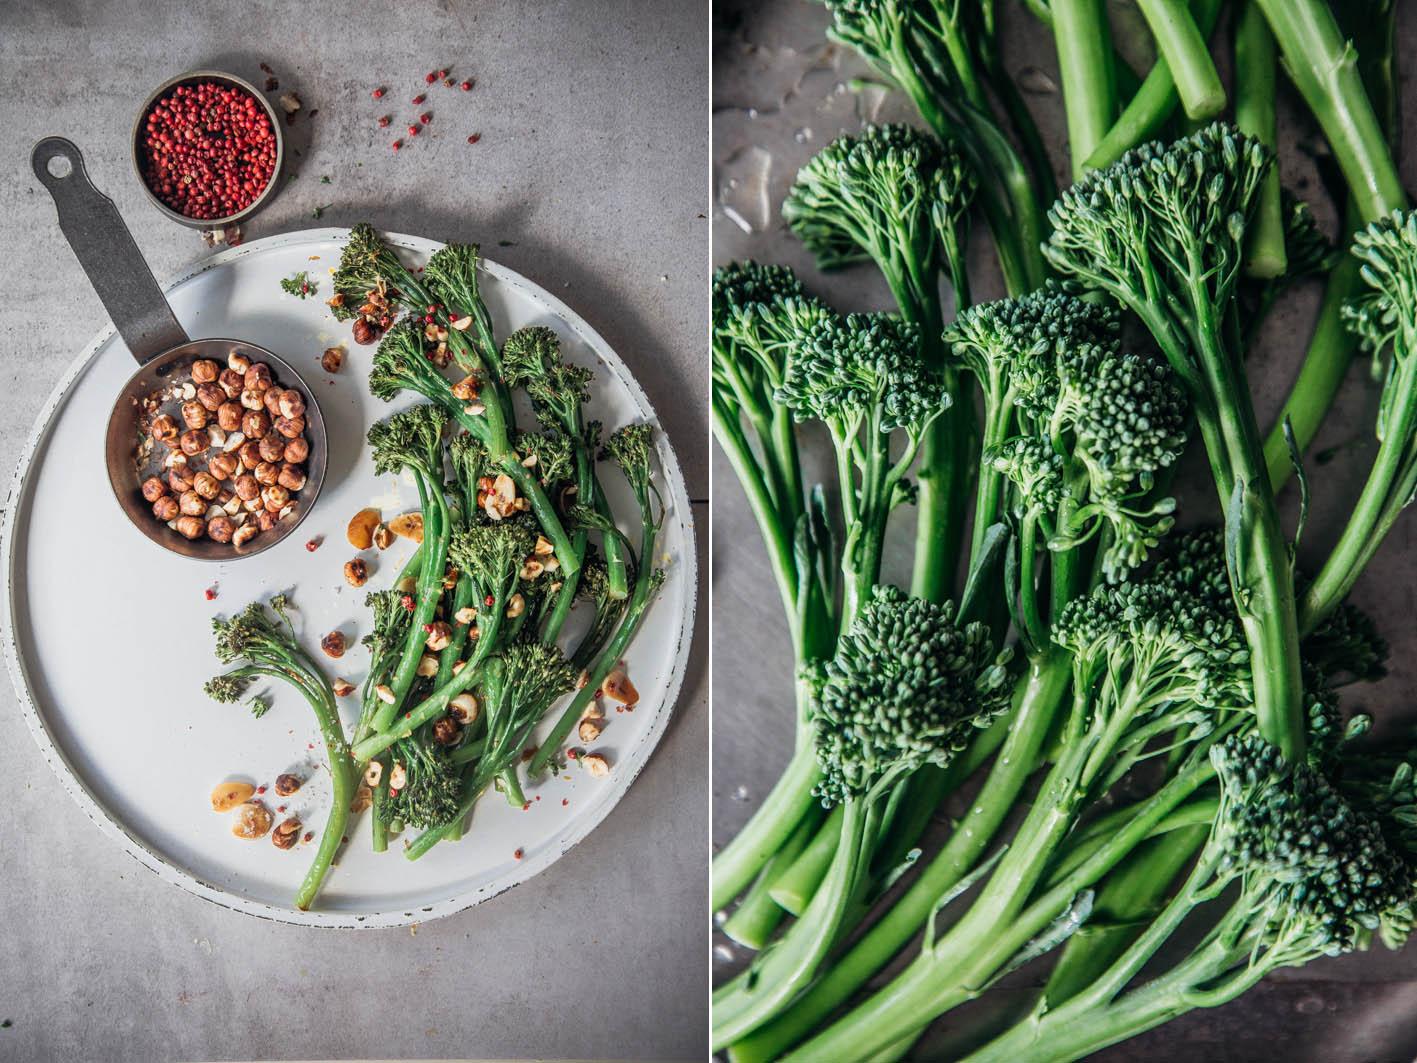 Bimi Broccolini geröstet mit Haselnüssen